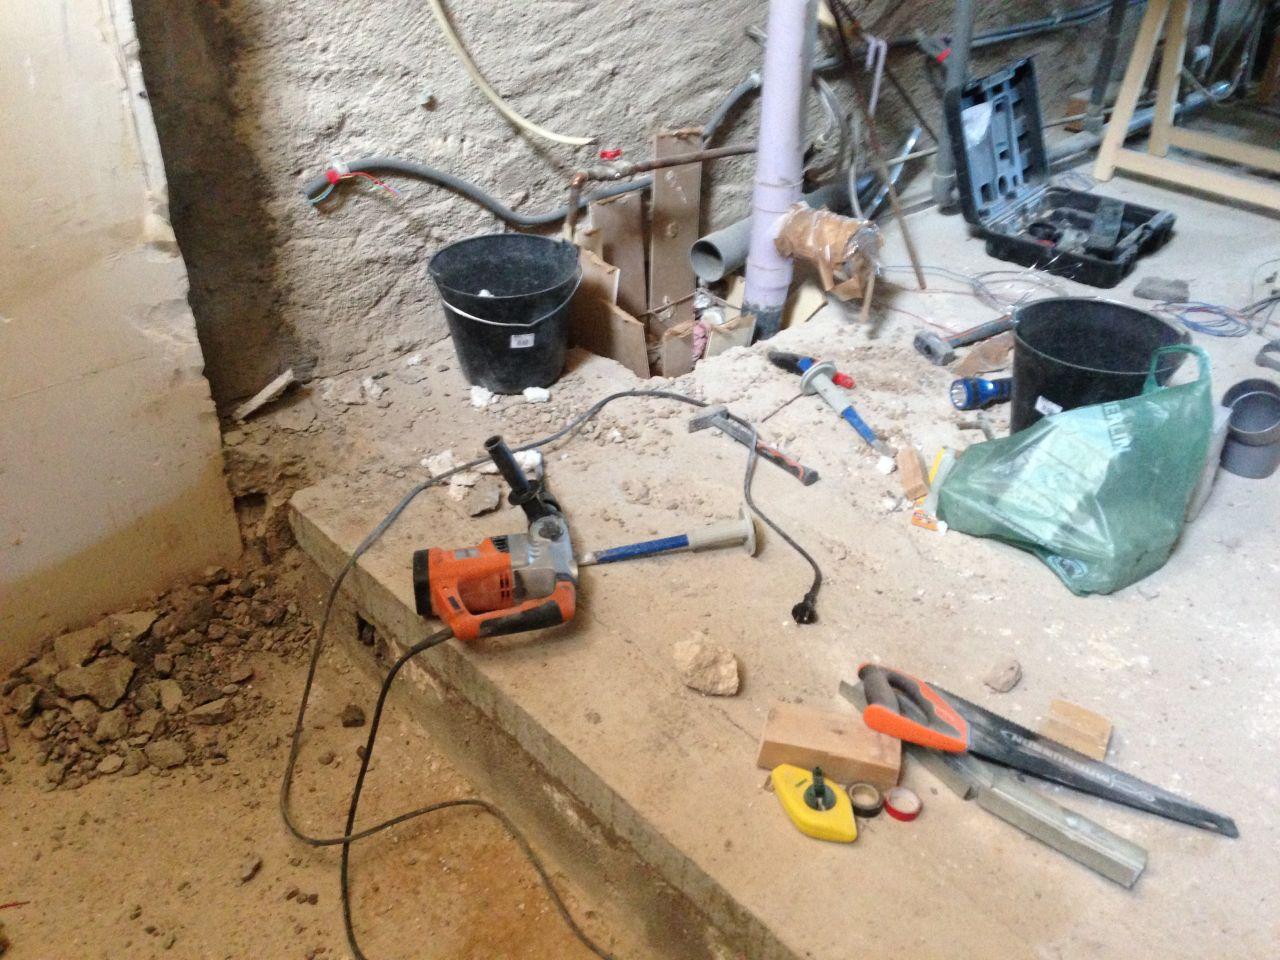 Renovation maison, dieulouard (meurthe et moselle)